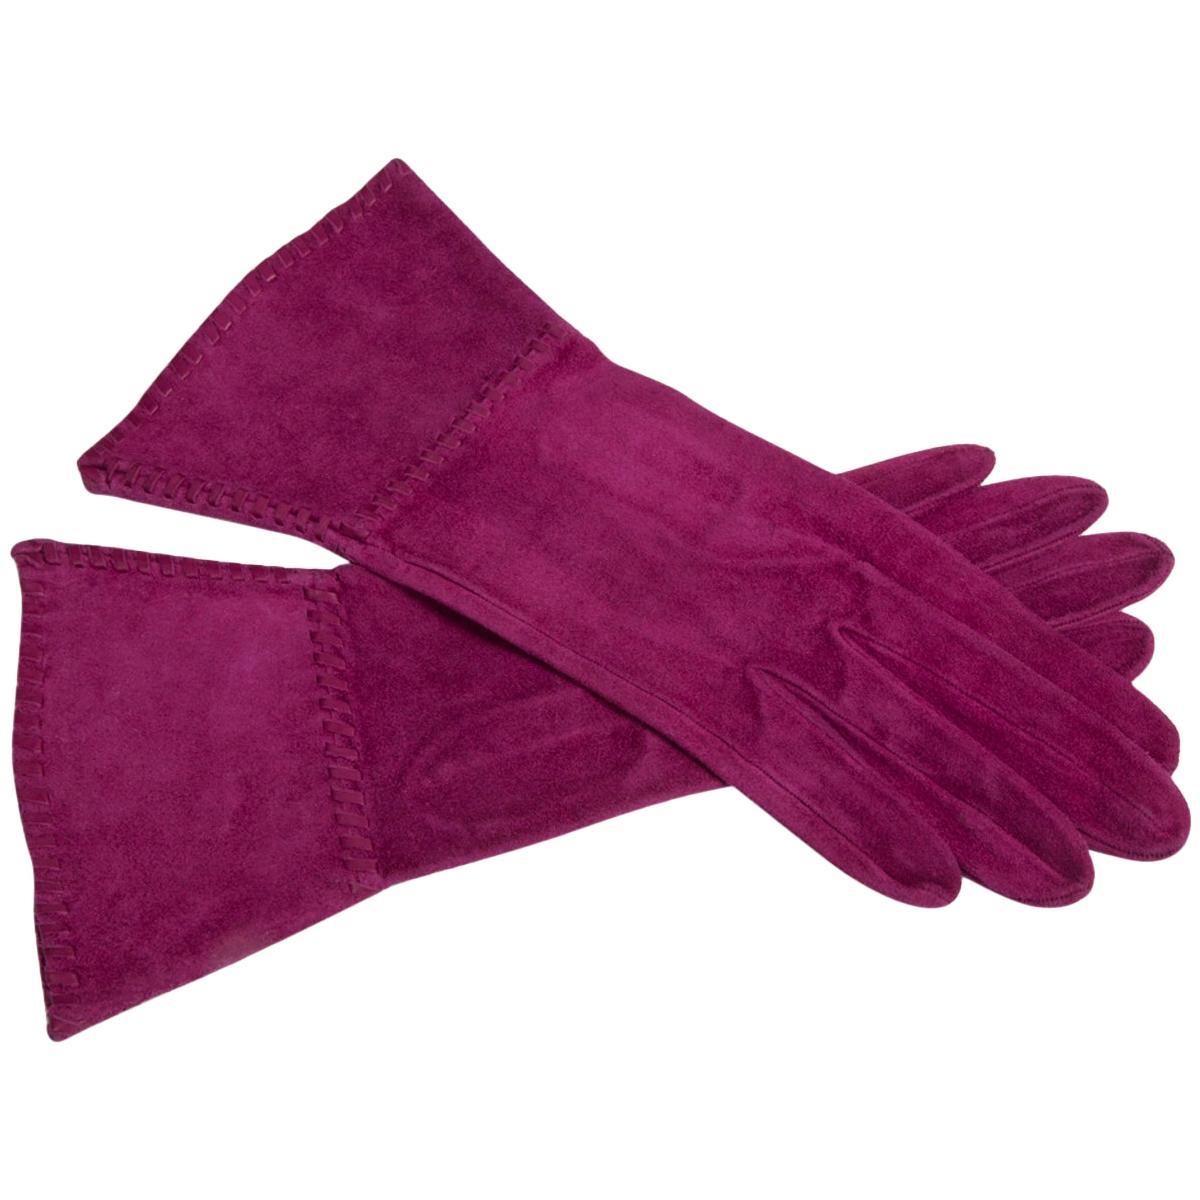 Yves Saint Laurent New Suede Gauntlet Gloves